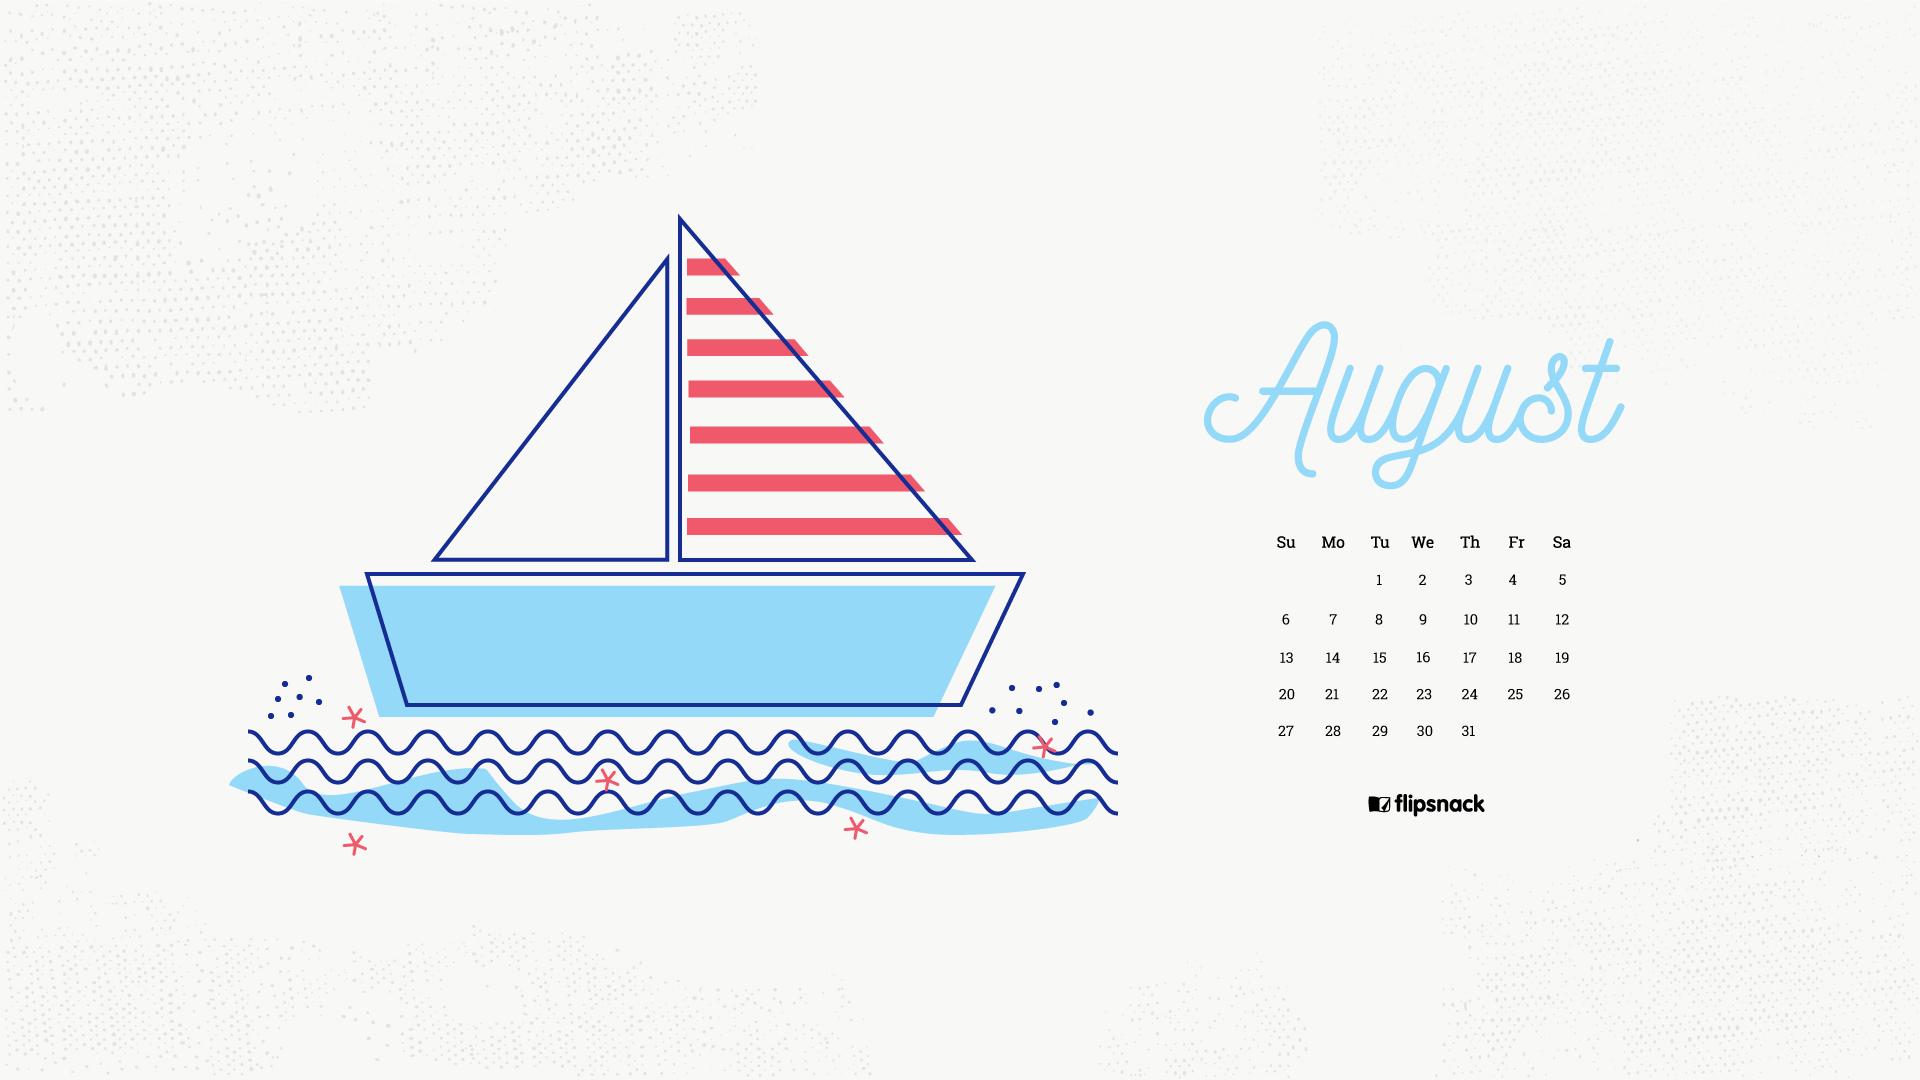 August 2017 Calendar Wallpaper For Desktop Background